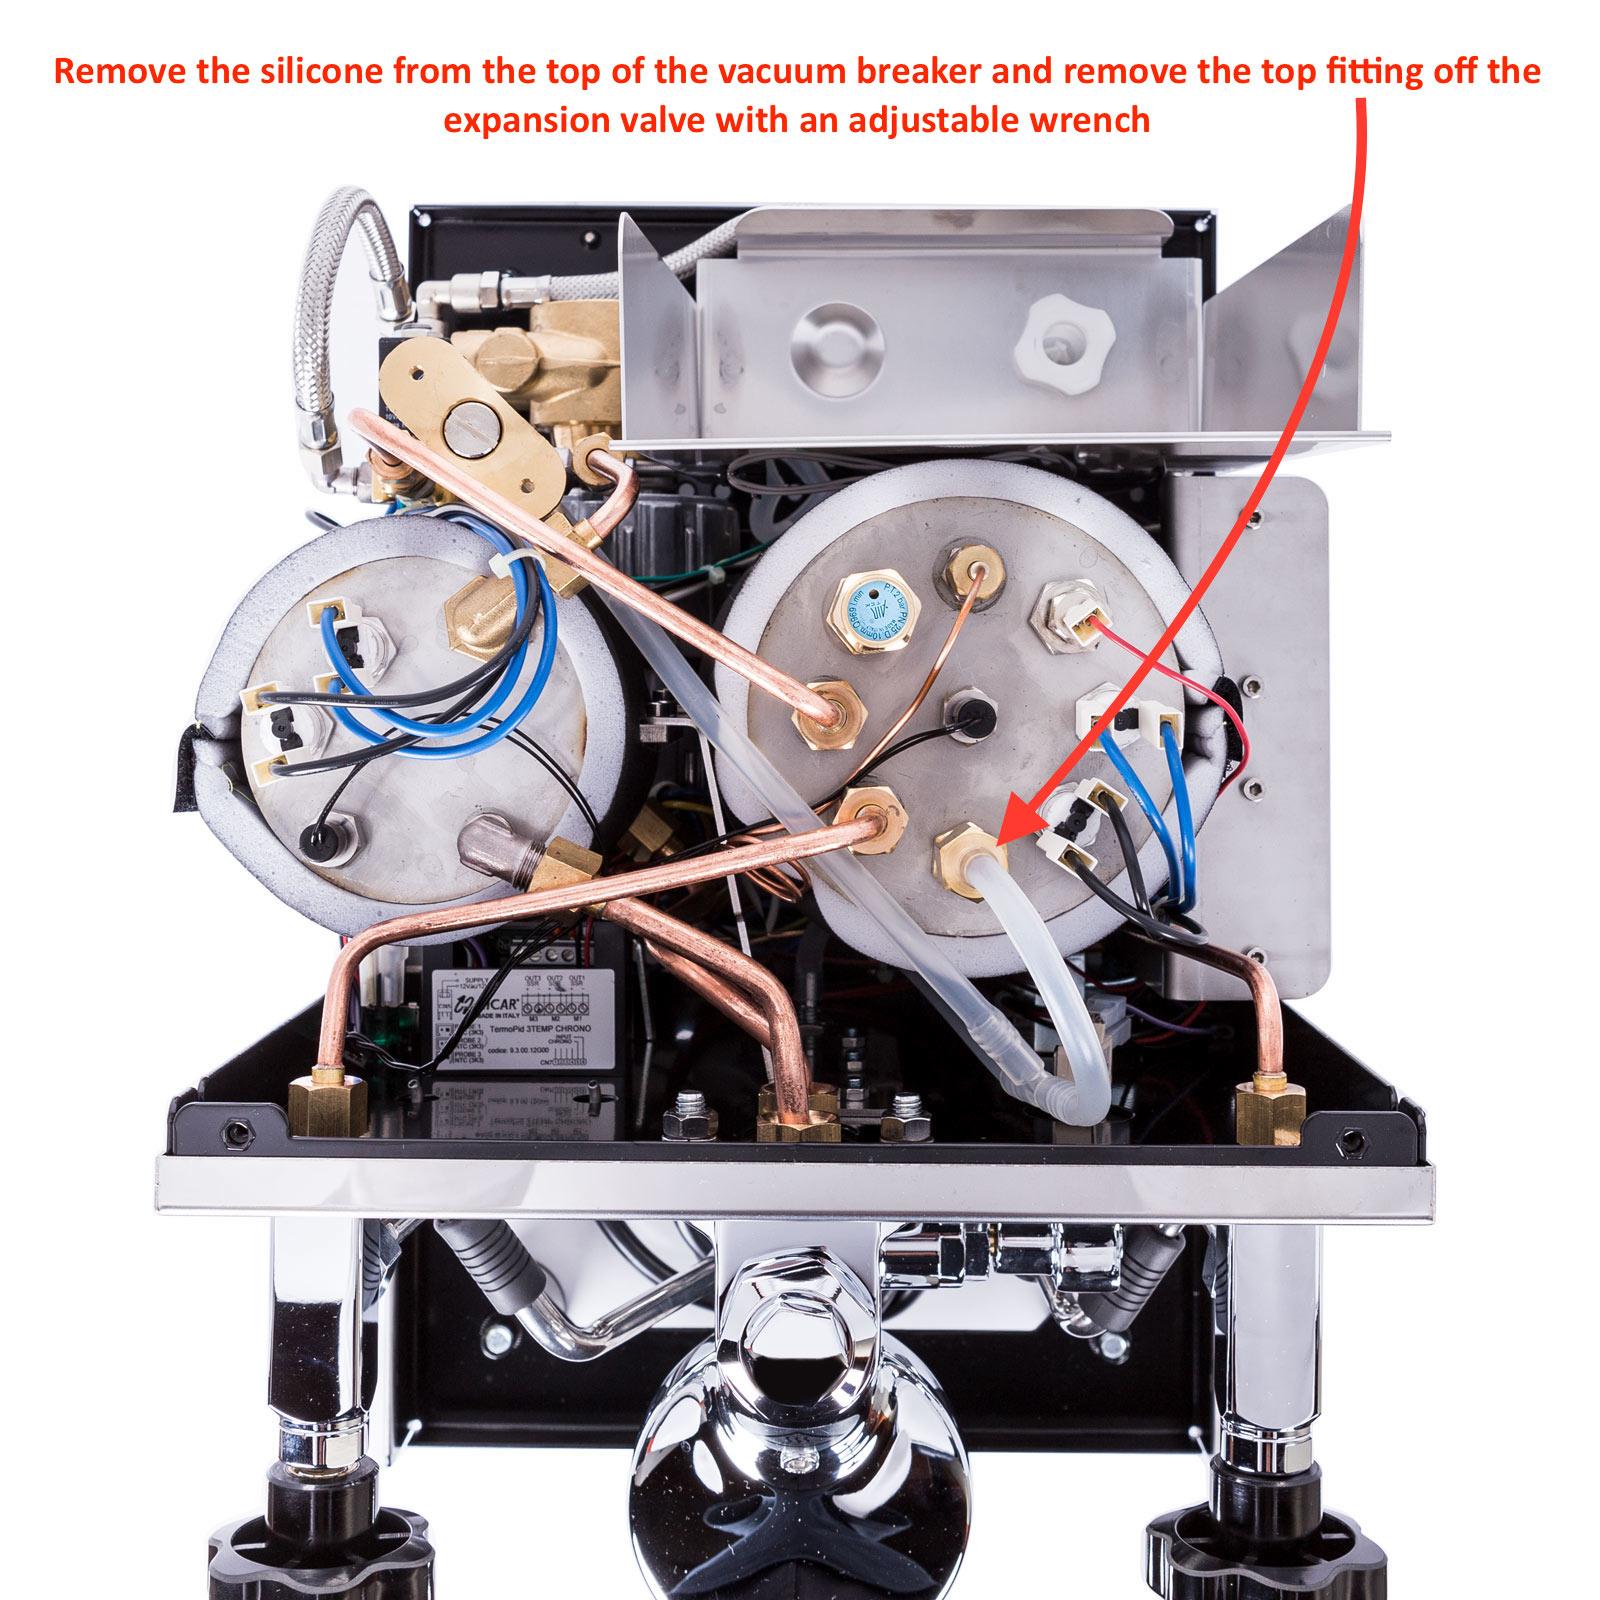 ECM Synchronika: Vacuum Breaker Replacement